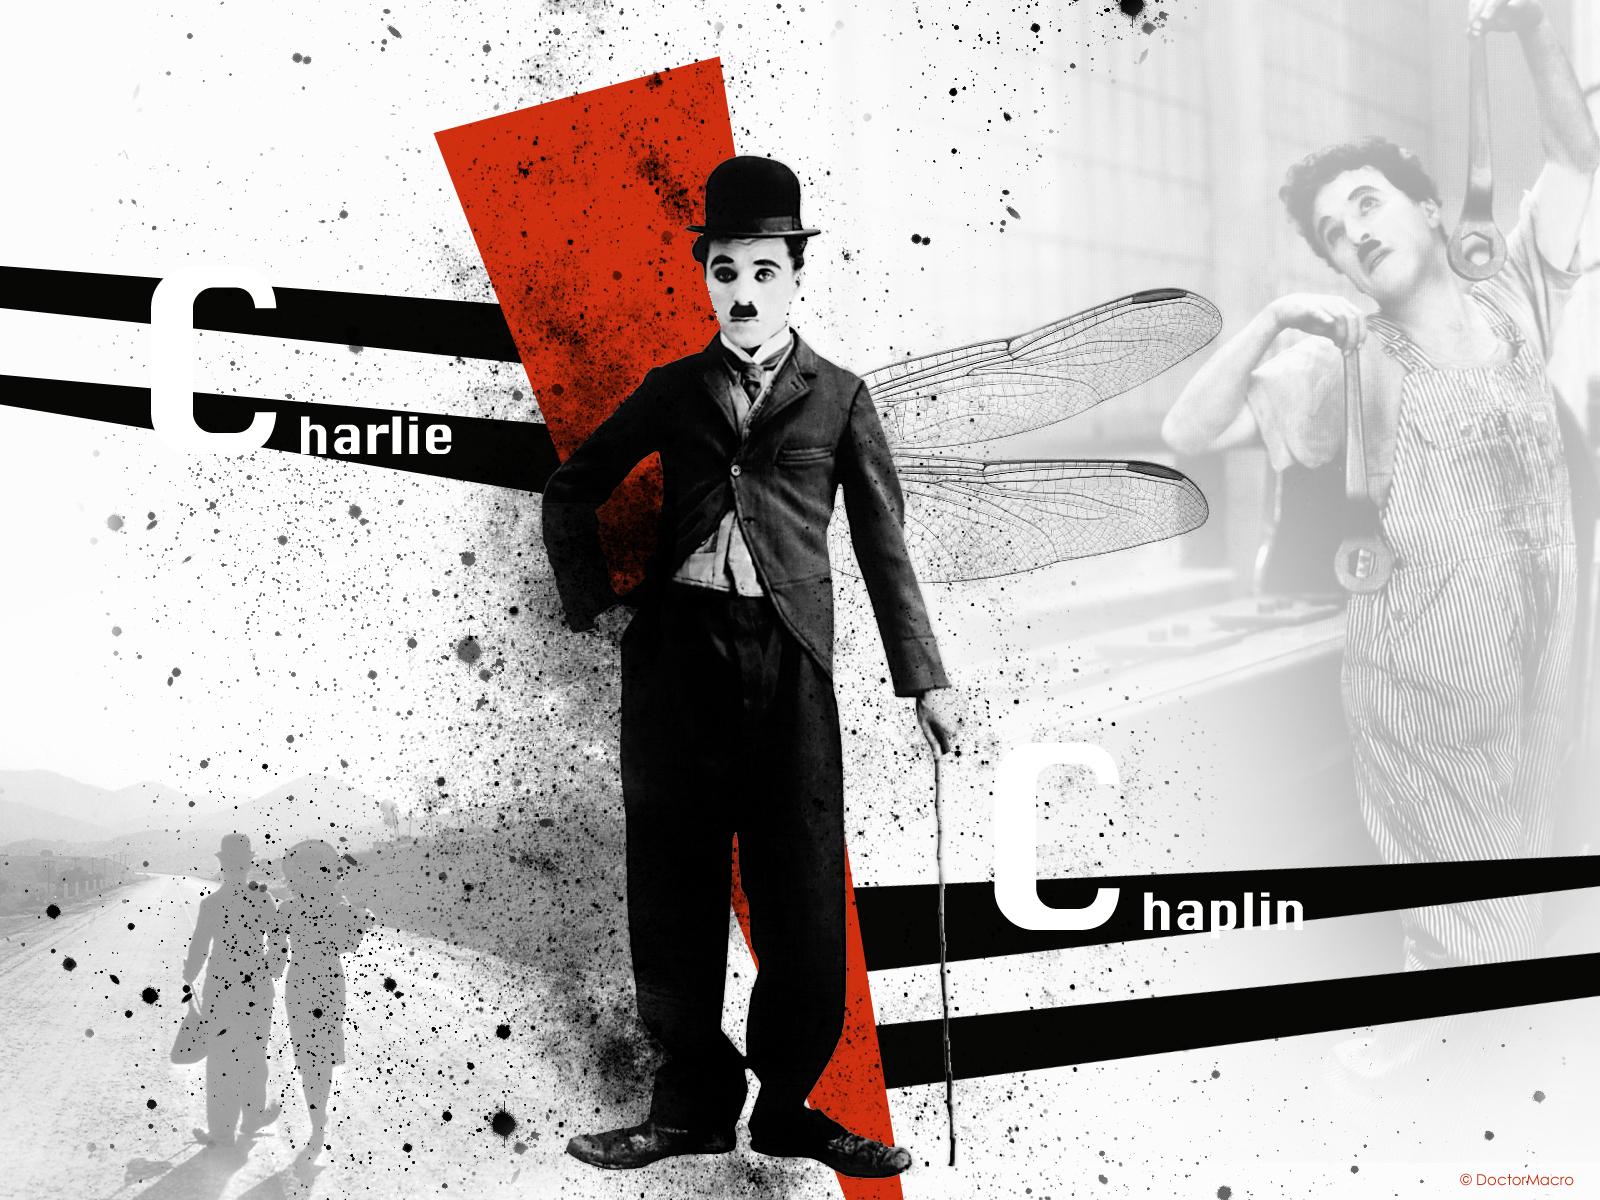 Charlie   Charlie Chaplin Wallpaper 9802132 1600x1200